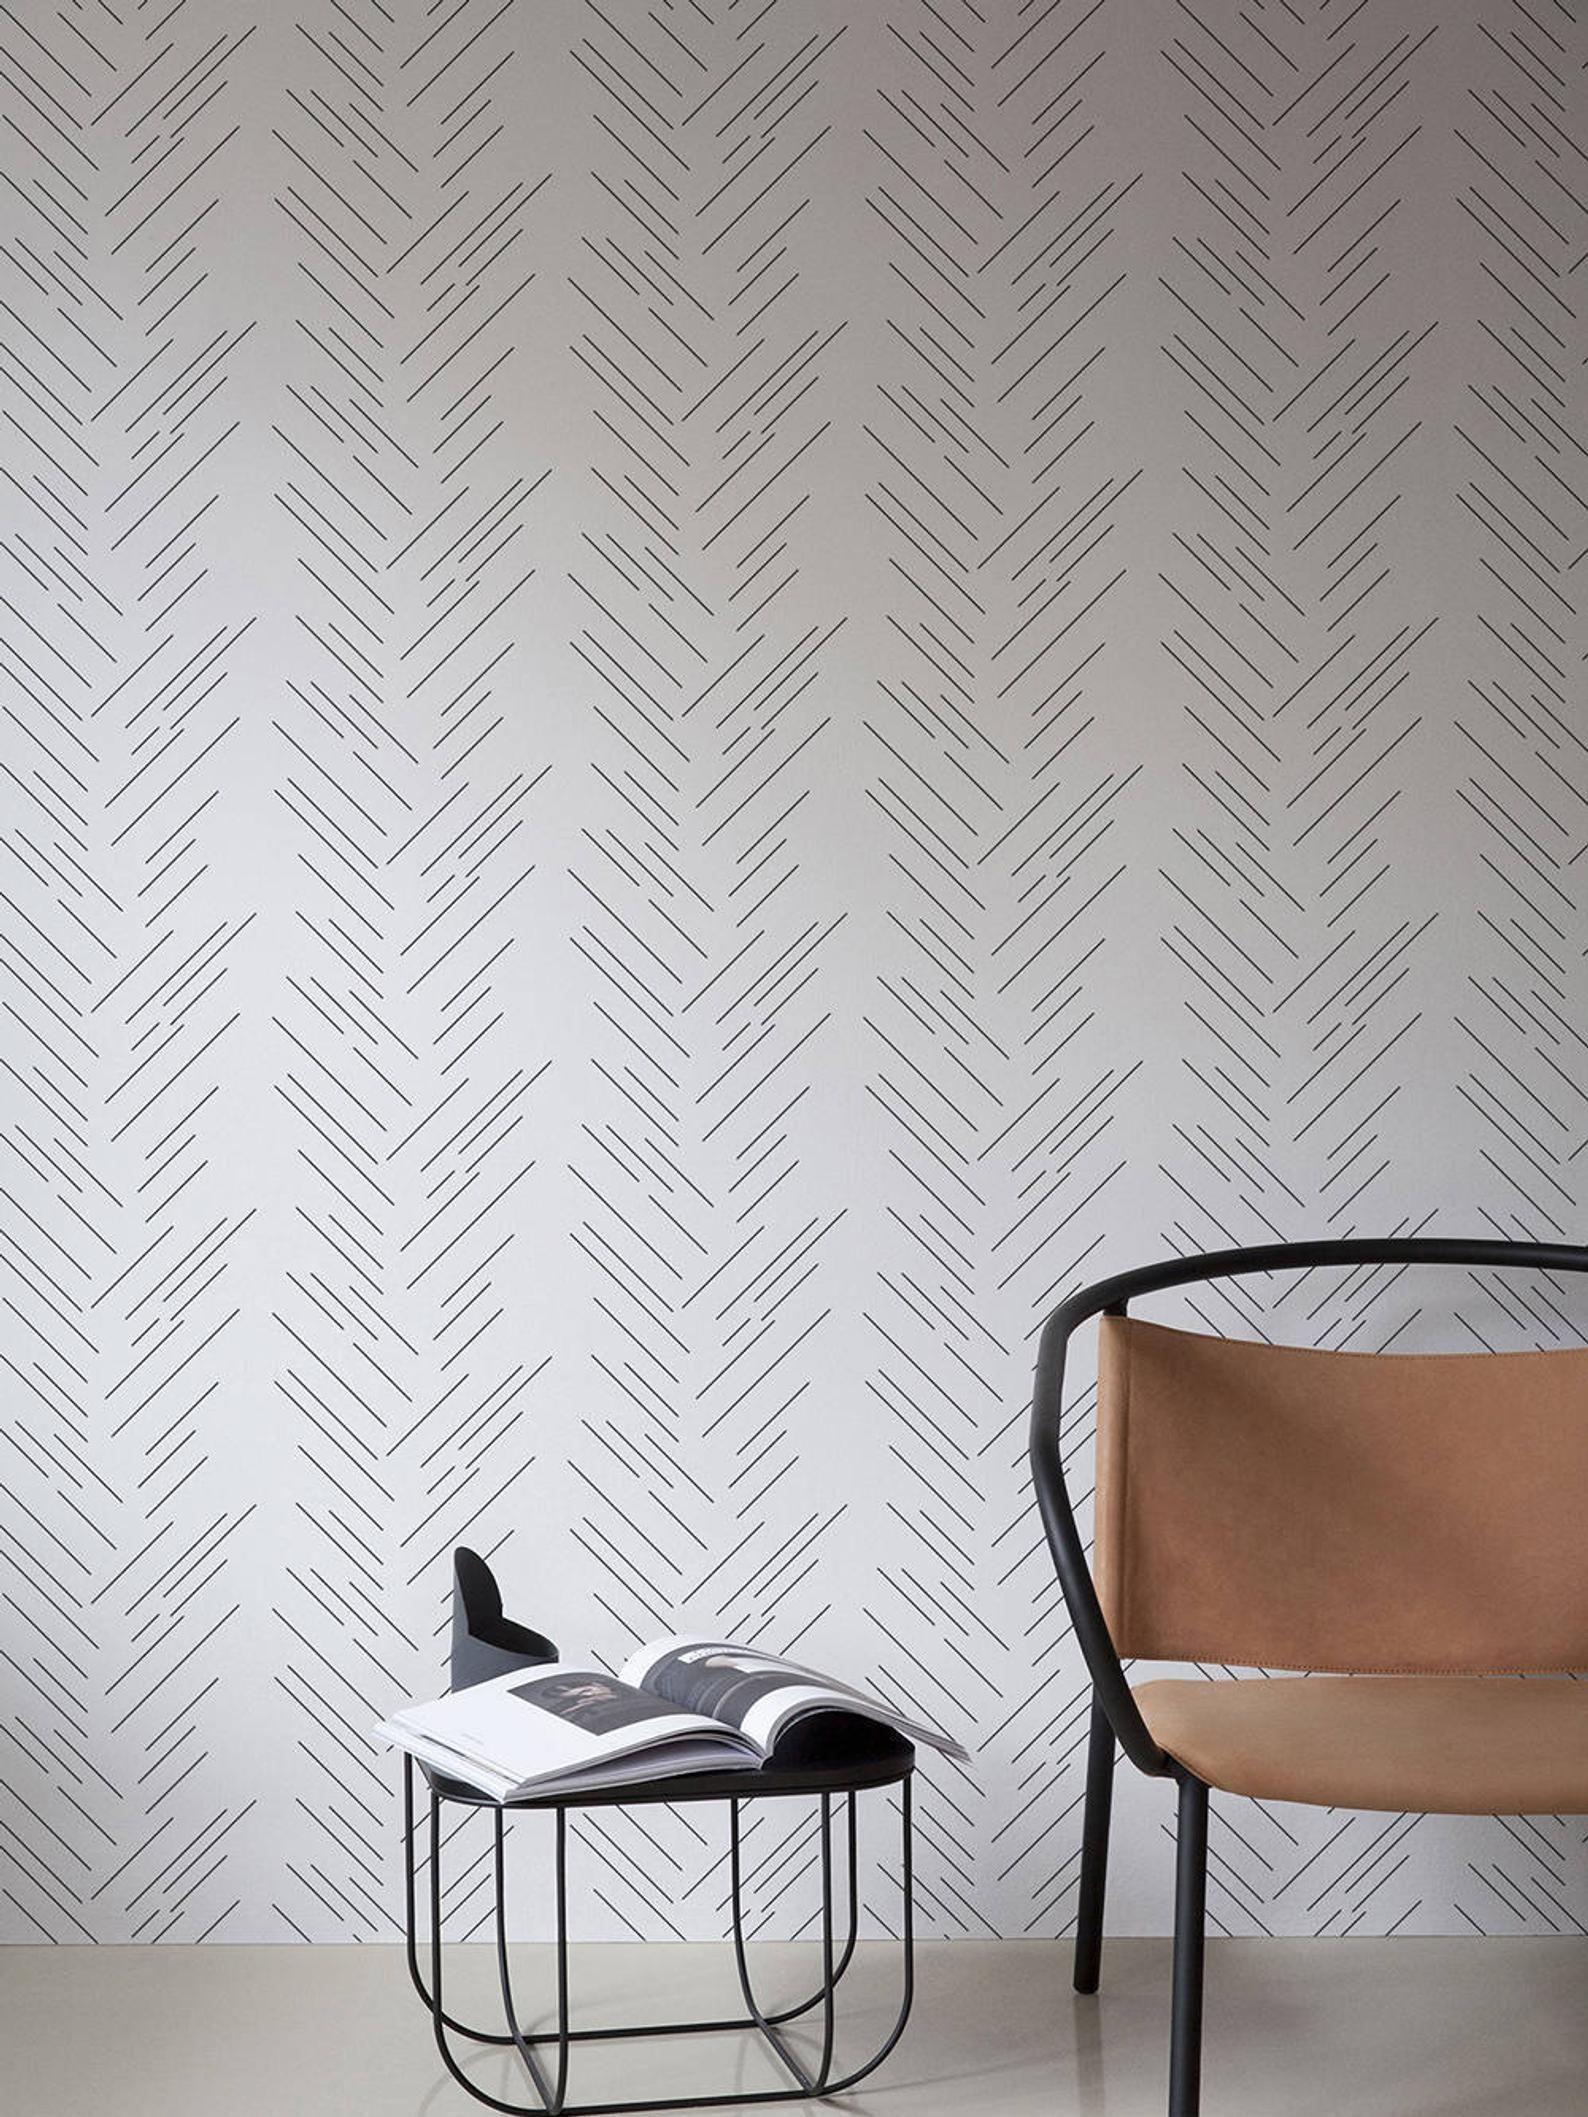 Chevron Wallpaper Peel And Stick Herringbone Wallpaper Etsy Herringbone Wallpaper Chevron Wallpaper Temporary Wallpaper